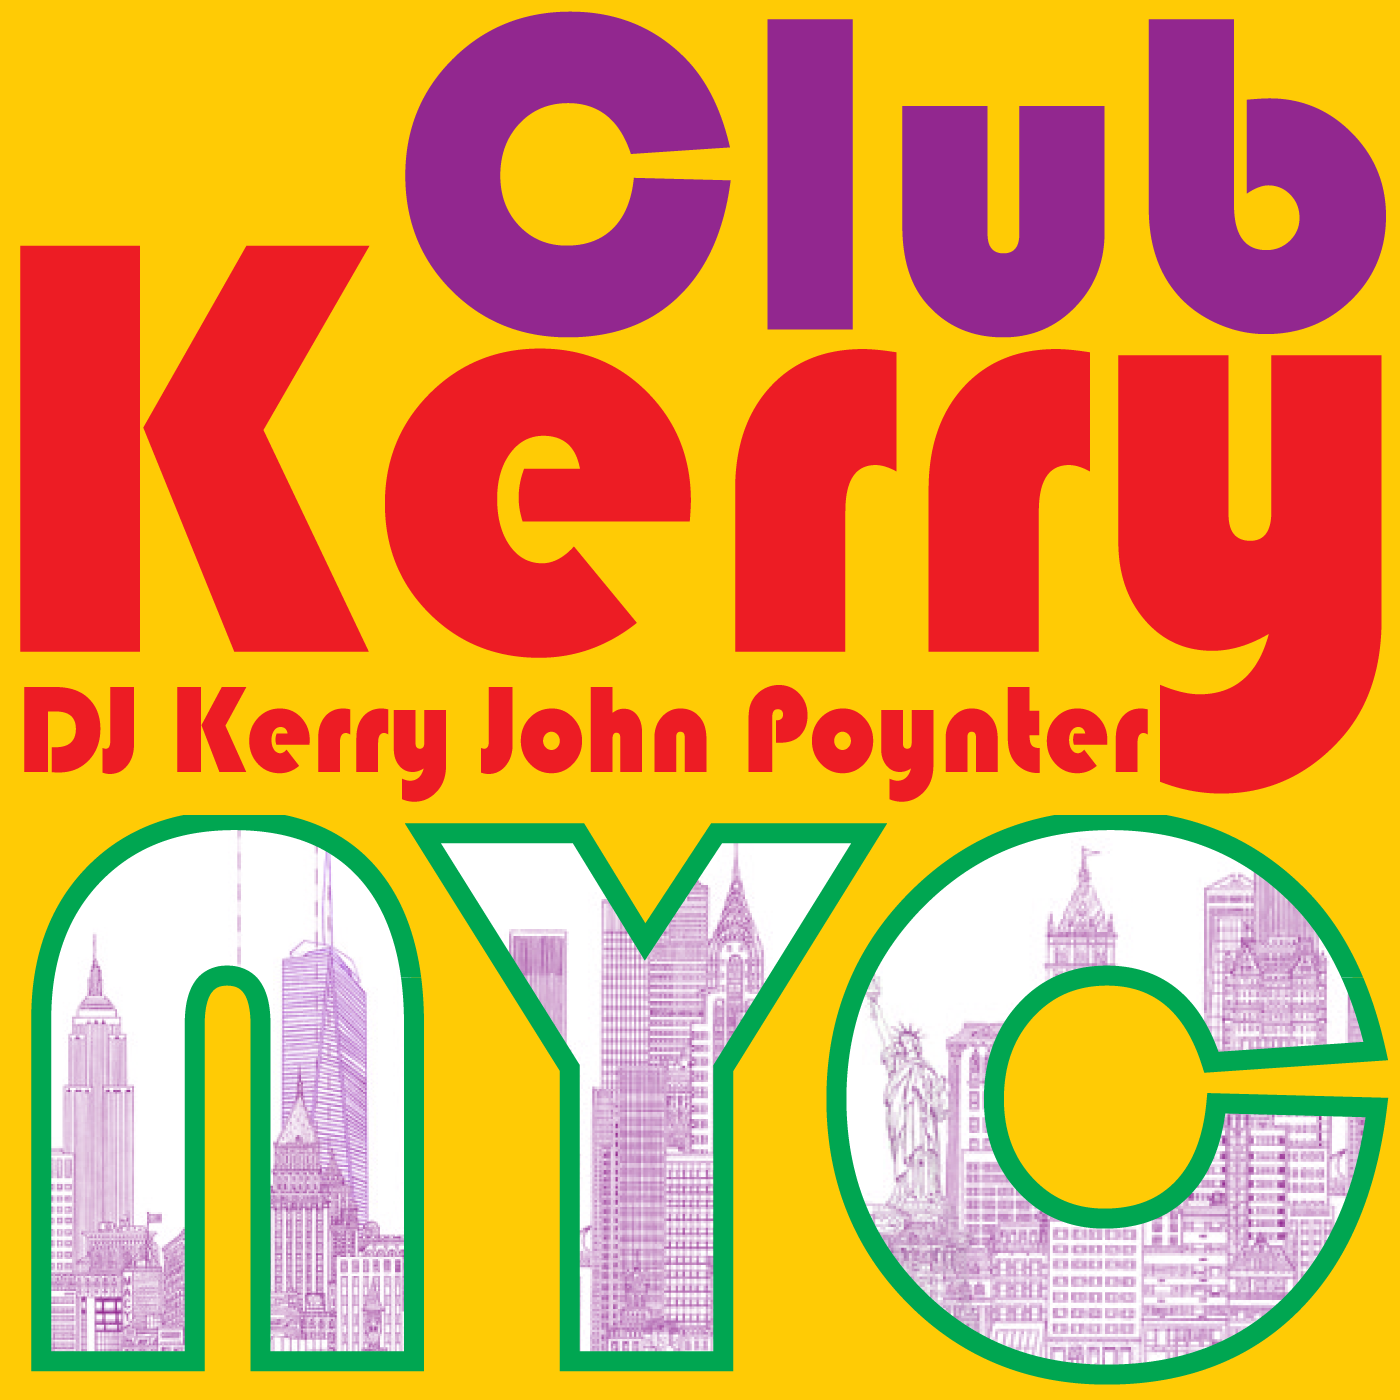 Rockaway Sounds (Vocal House, Progressive House) - DJ Kerry John Poynter show art